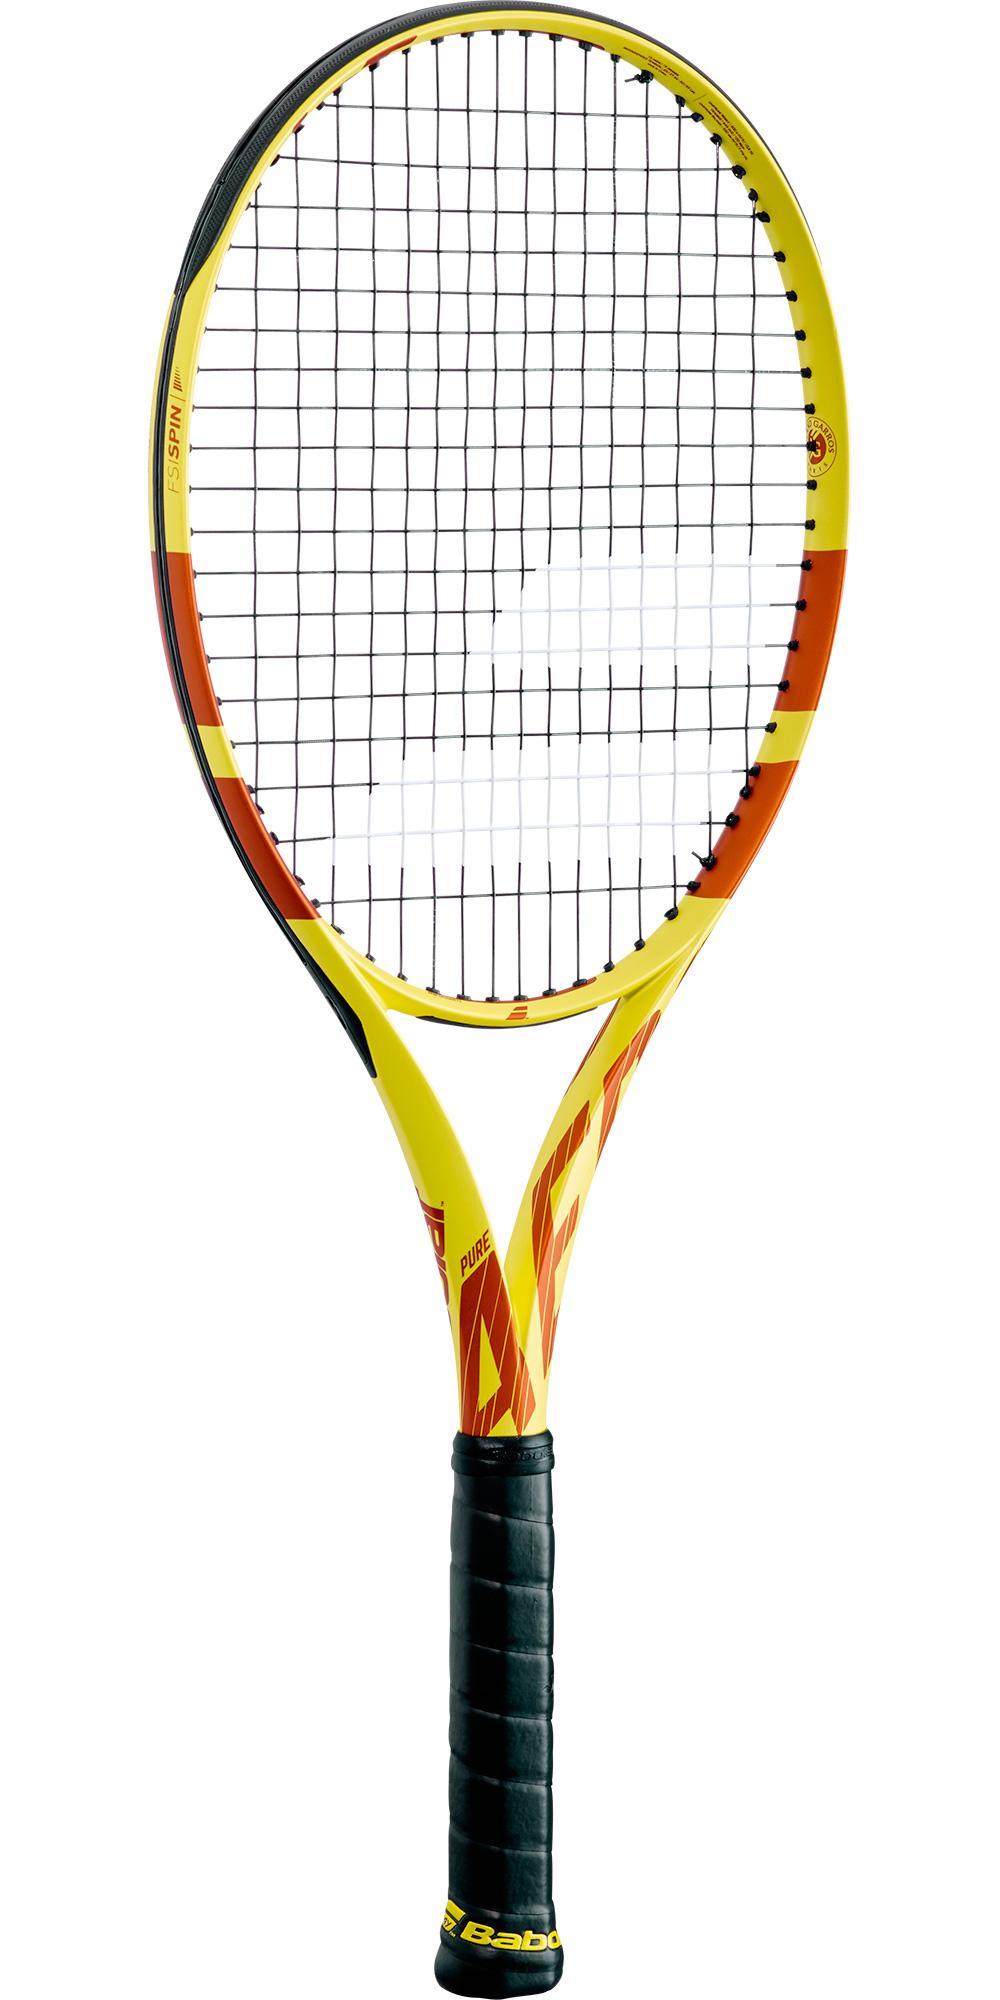 83960664a11b Babolat Pure Aero Roland Garros Tennis Racket  Frame Only  - Tennisnuts.com